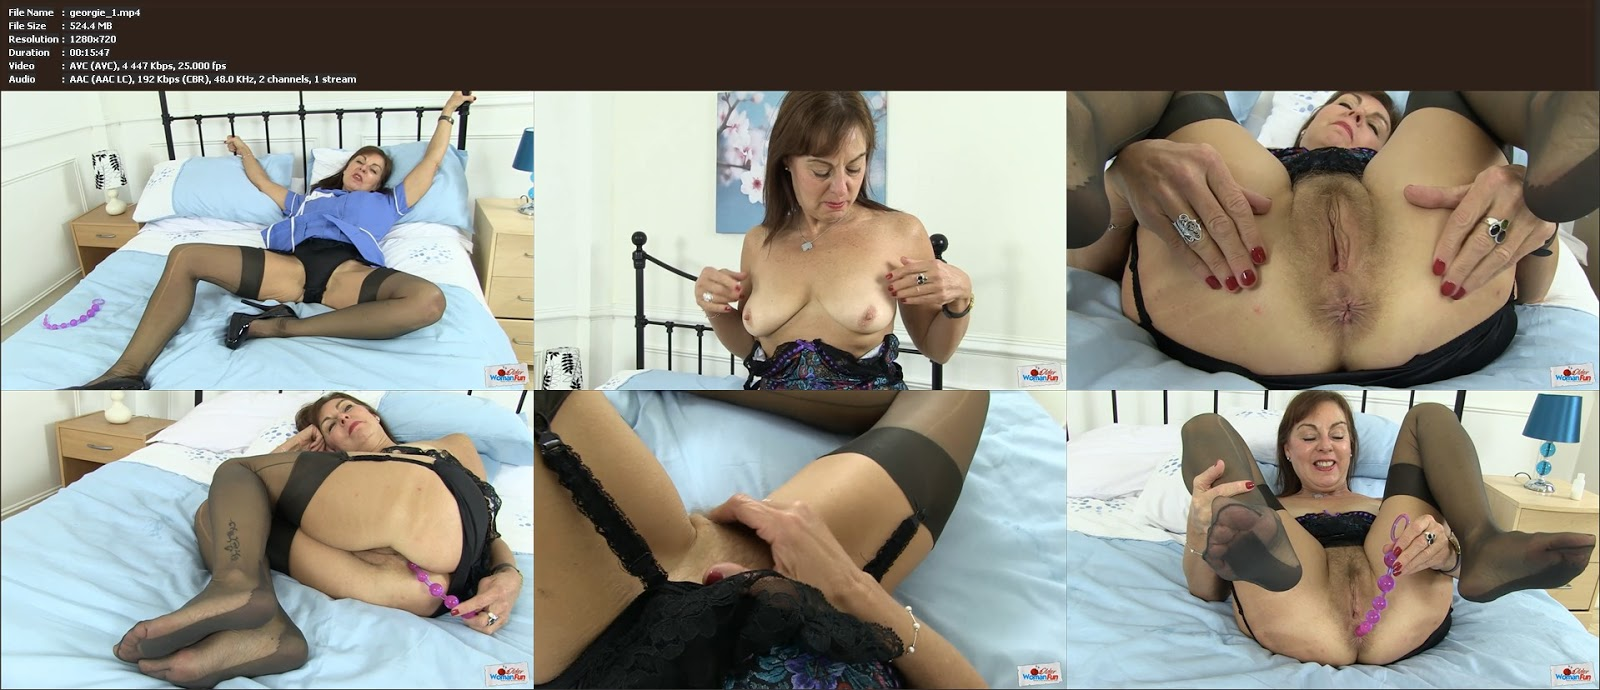 Georgie Mature Older Woman Porn Videos 76